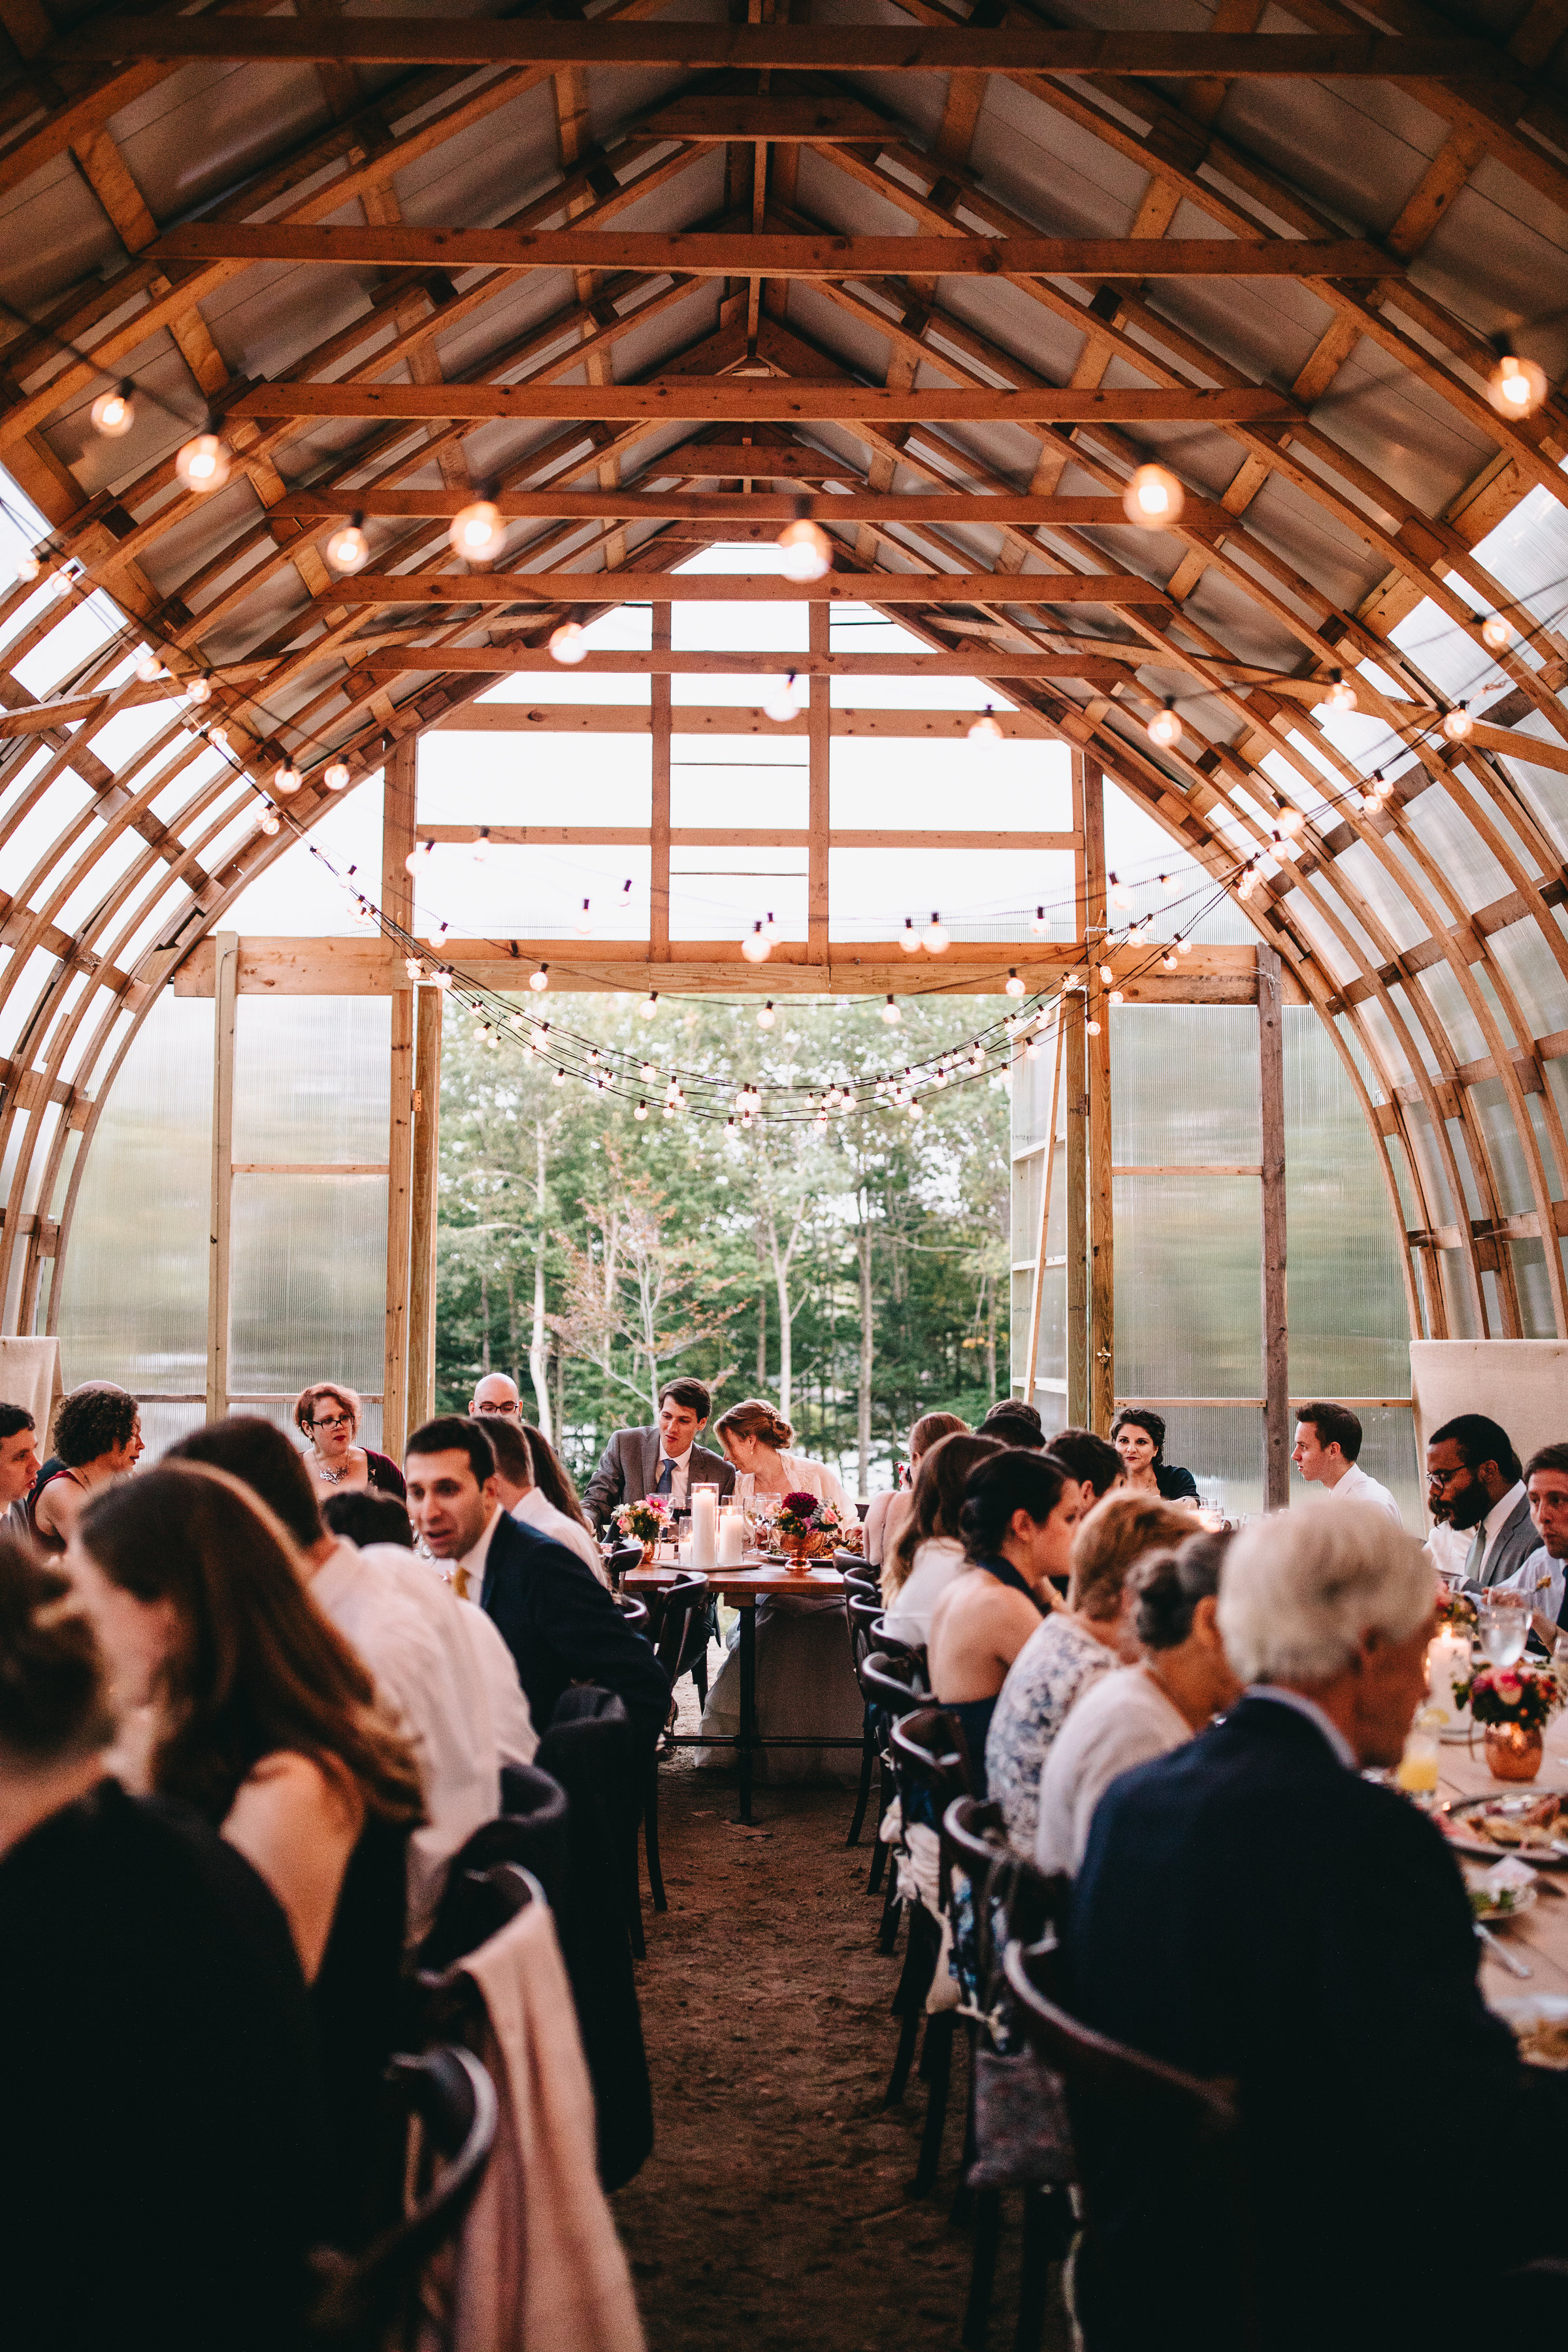 Our Wedding - Maine Barn Wedding {Katie at the Kitchen Door}